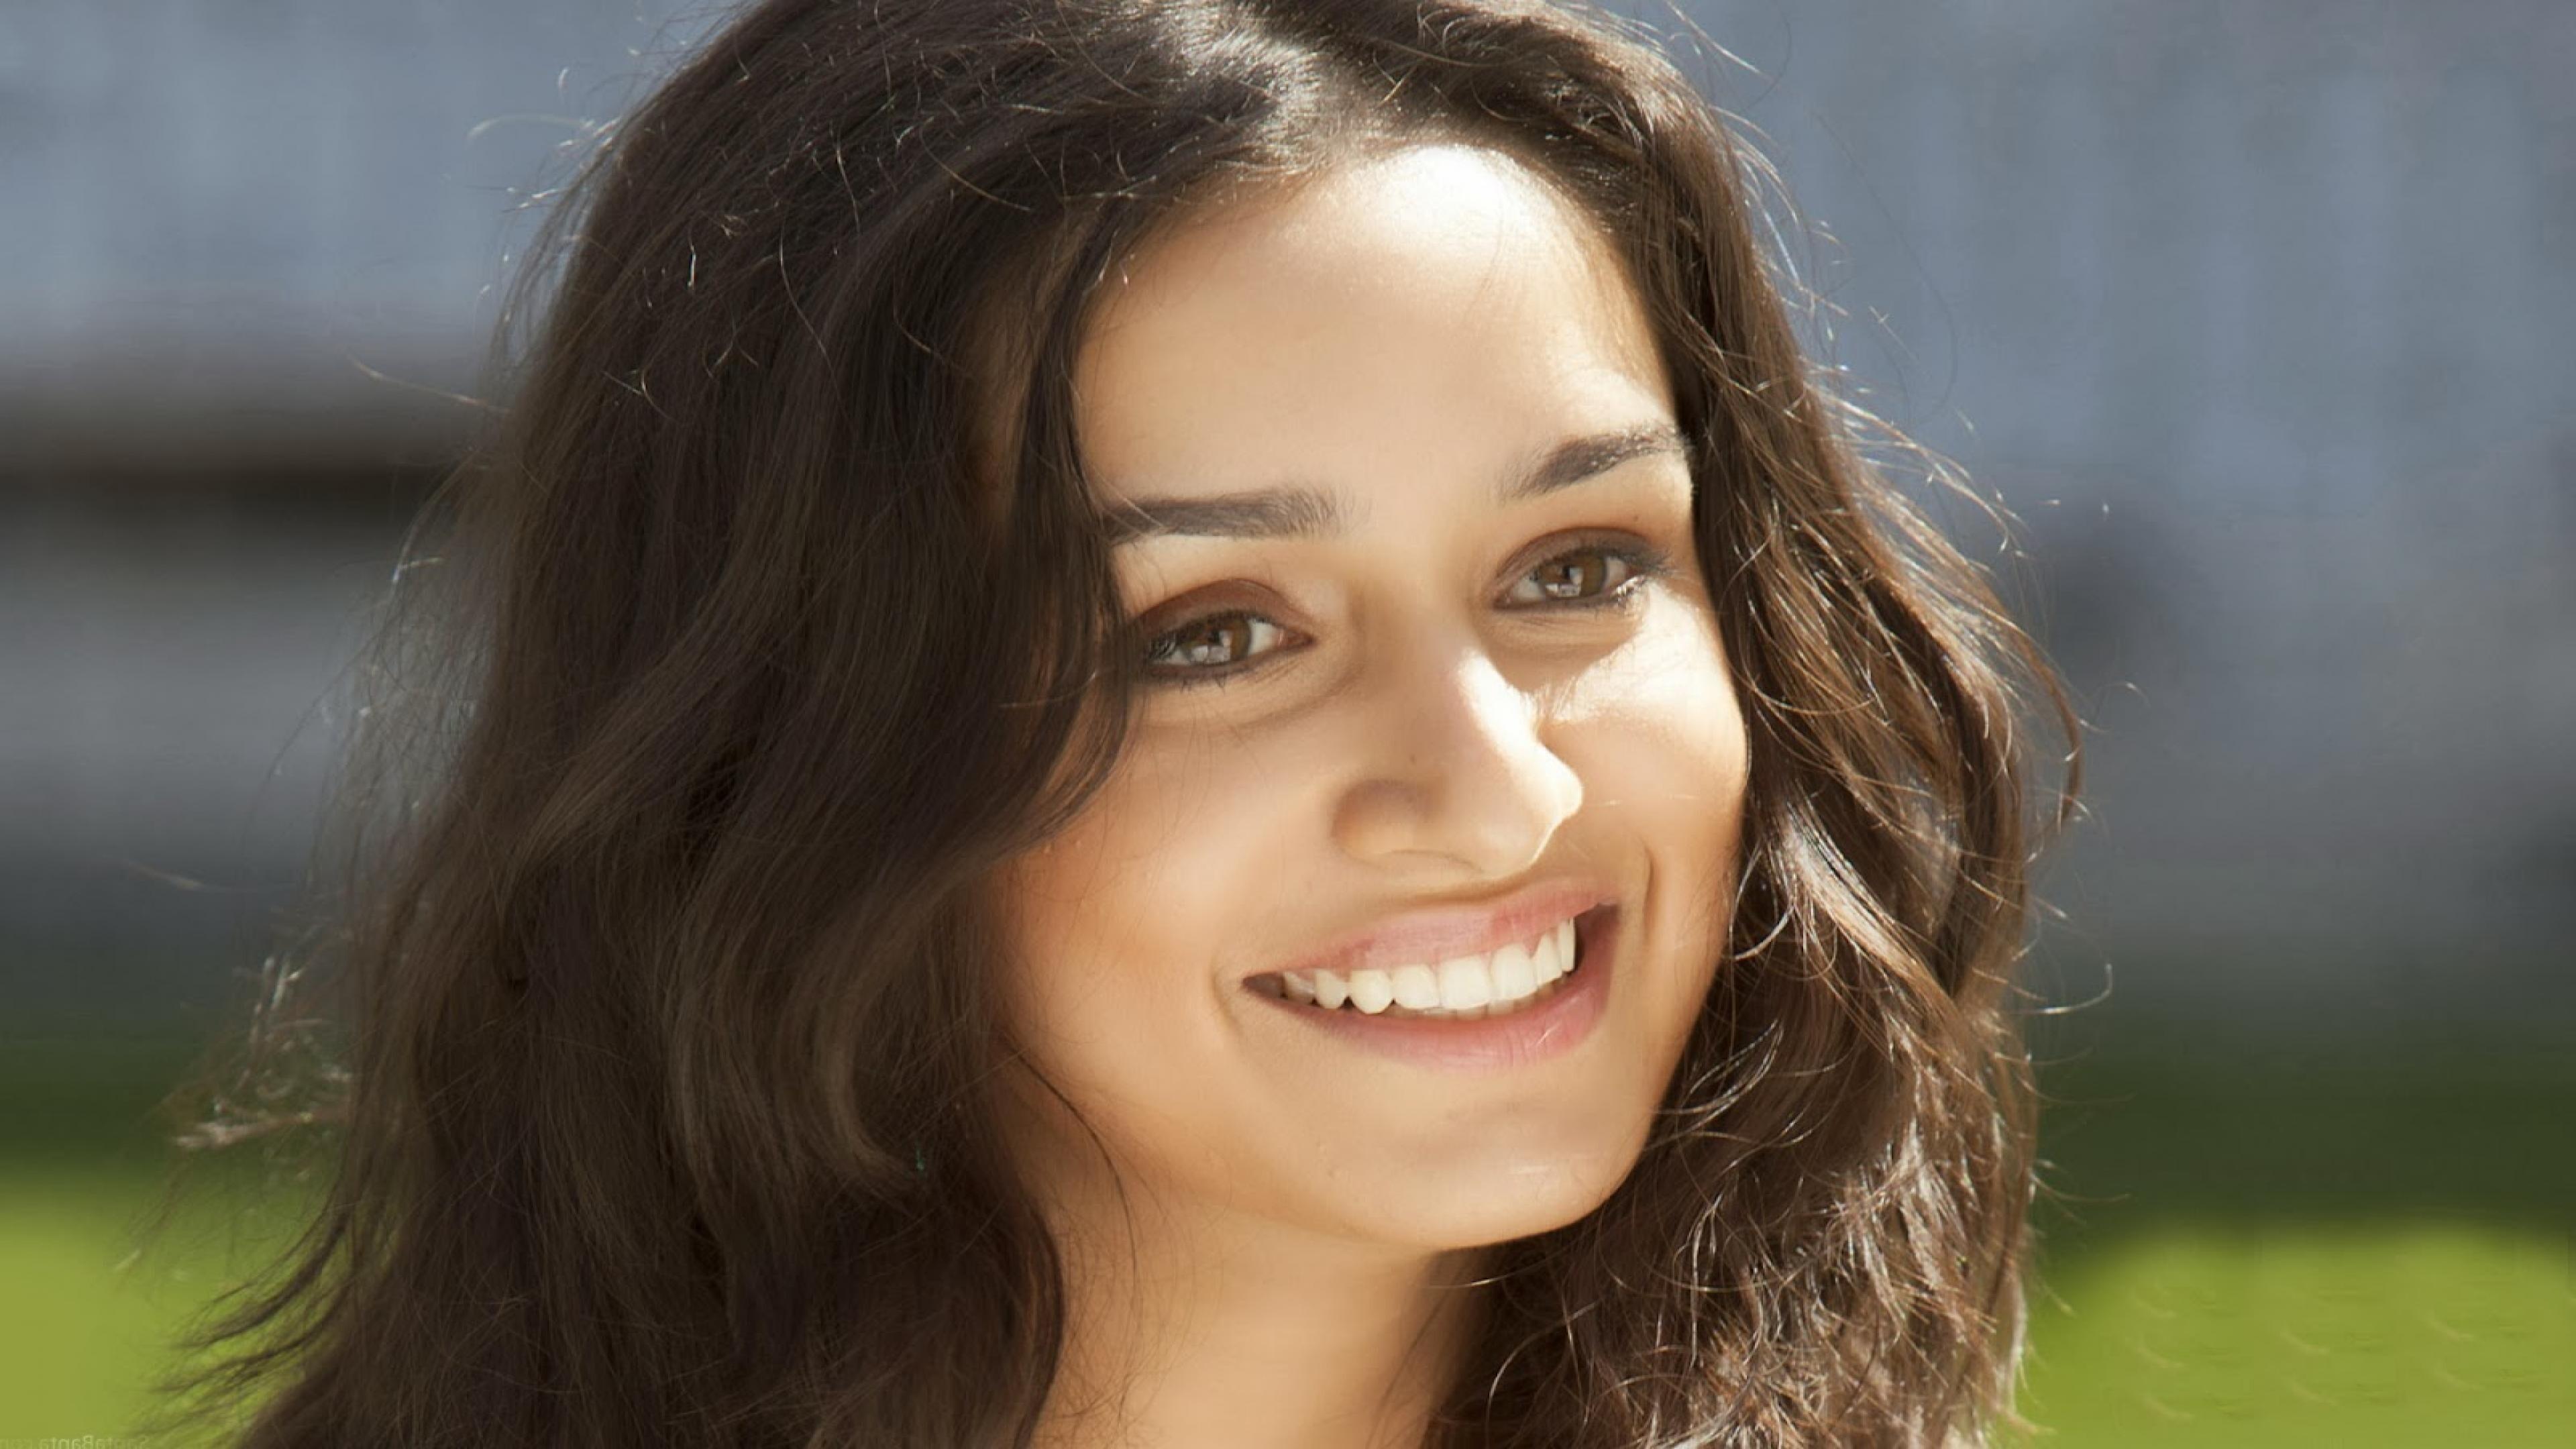 [160+] Shraddha Kapoor Beautiful HD Photos & Mobile